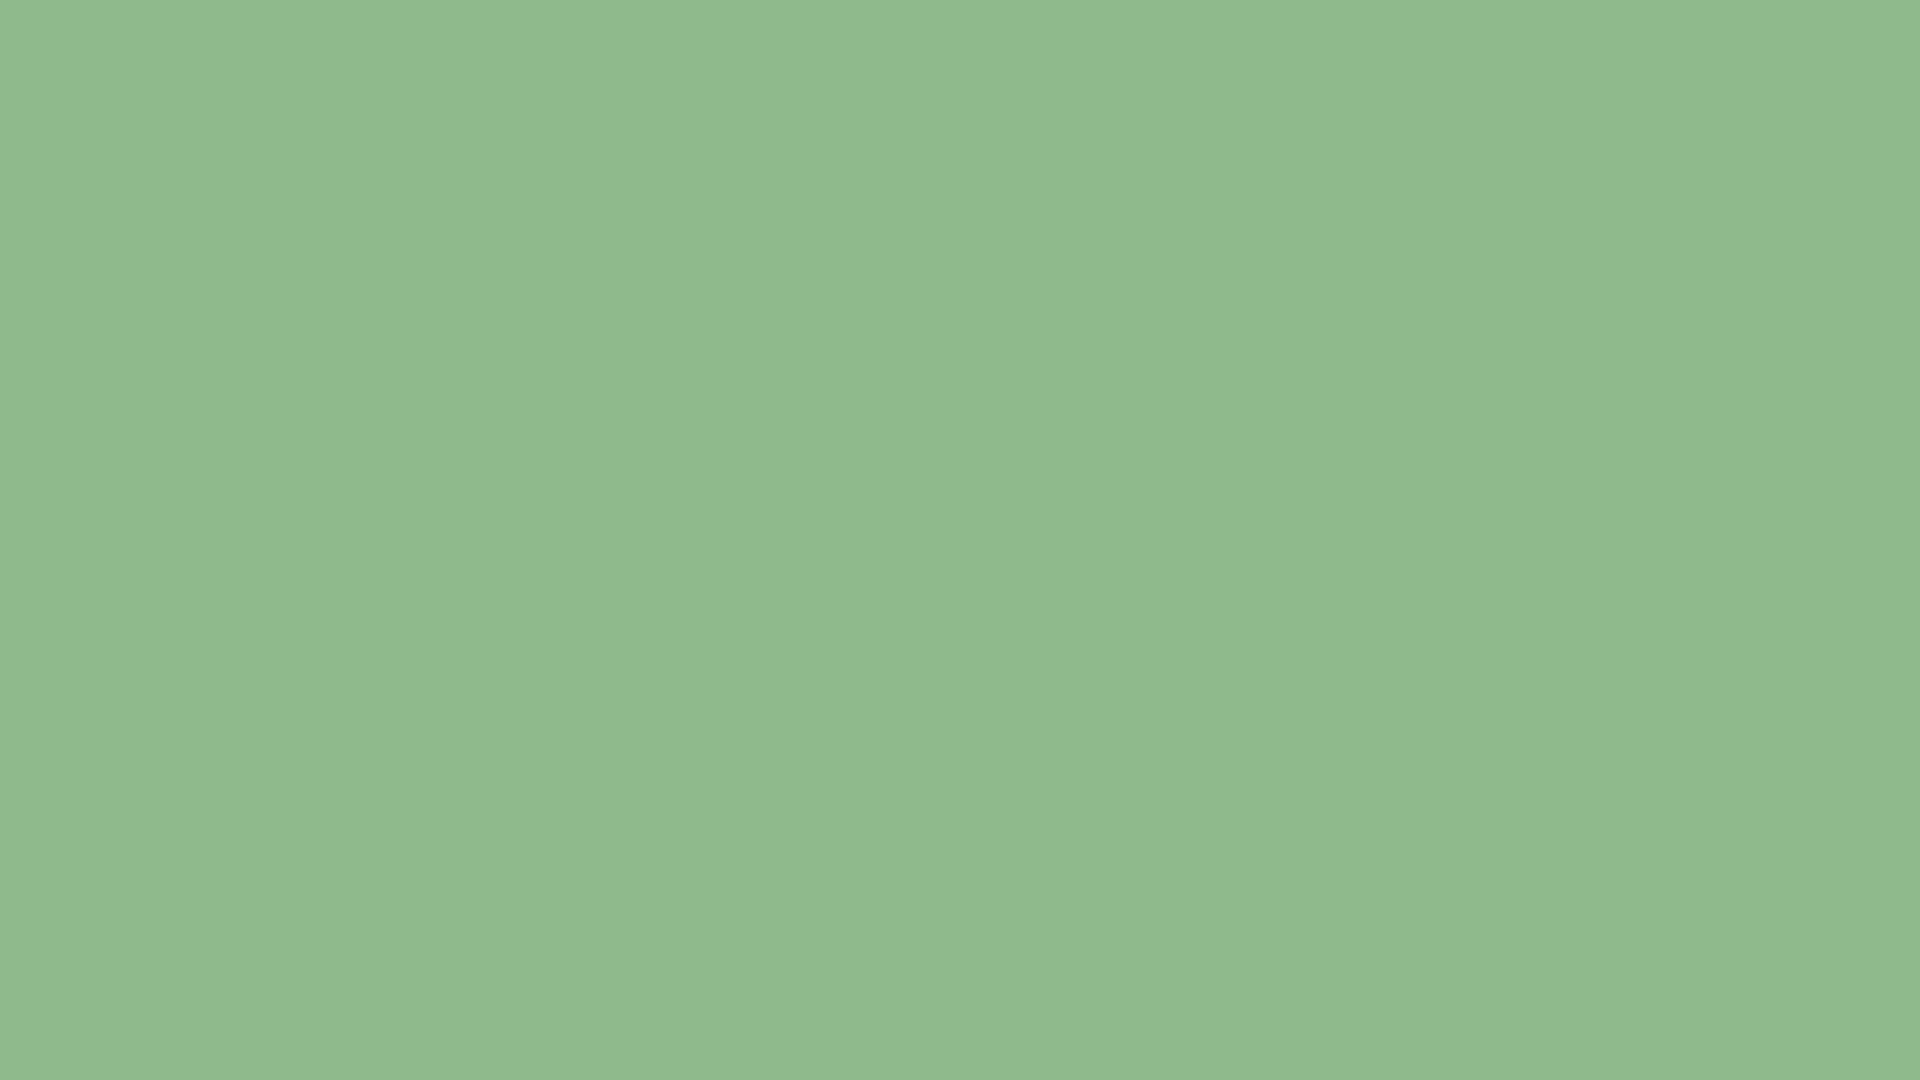 1920x1080 Dark Sea Green Solid Color Background